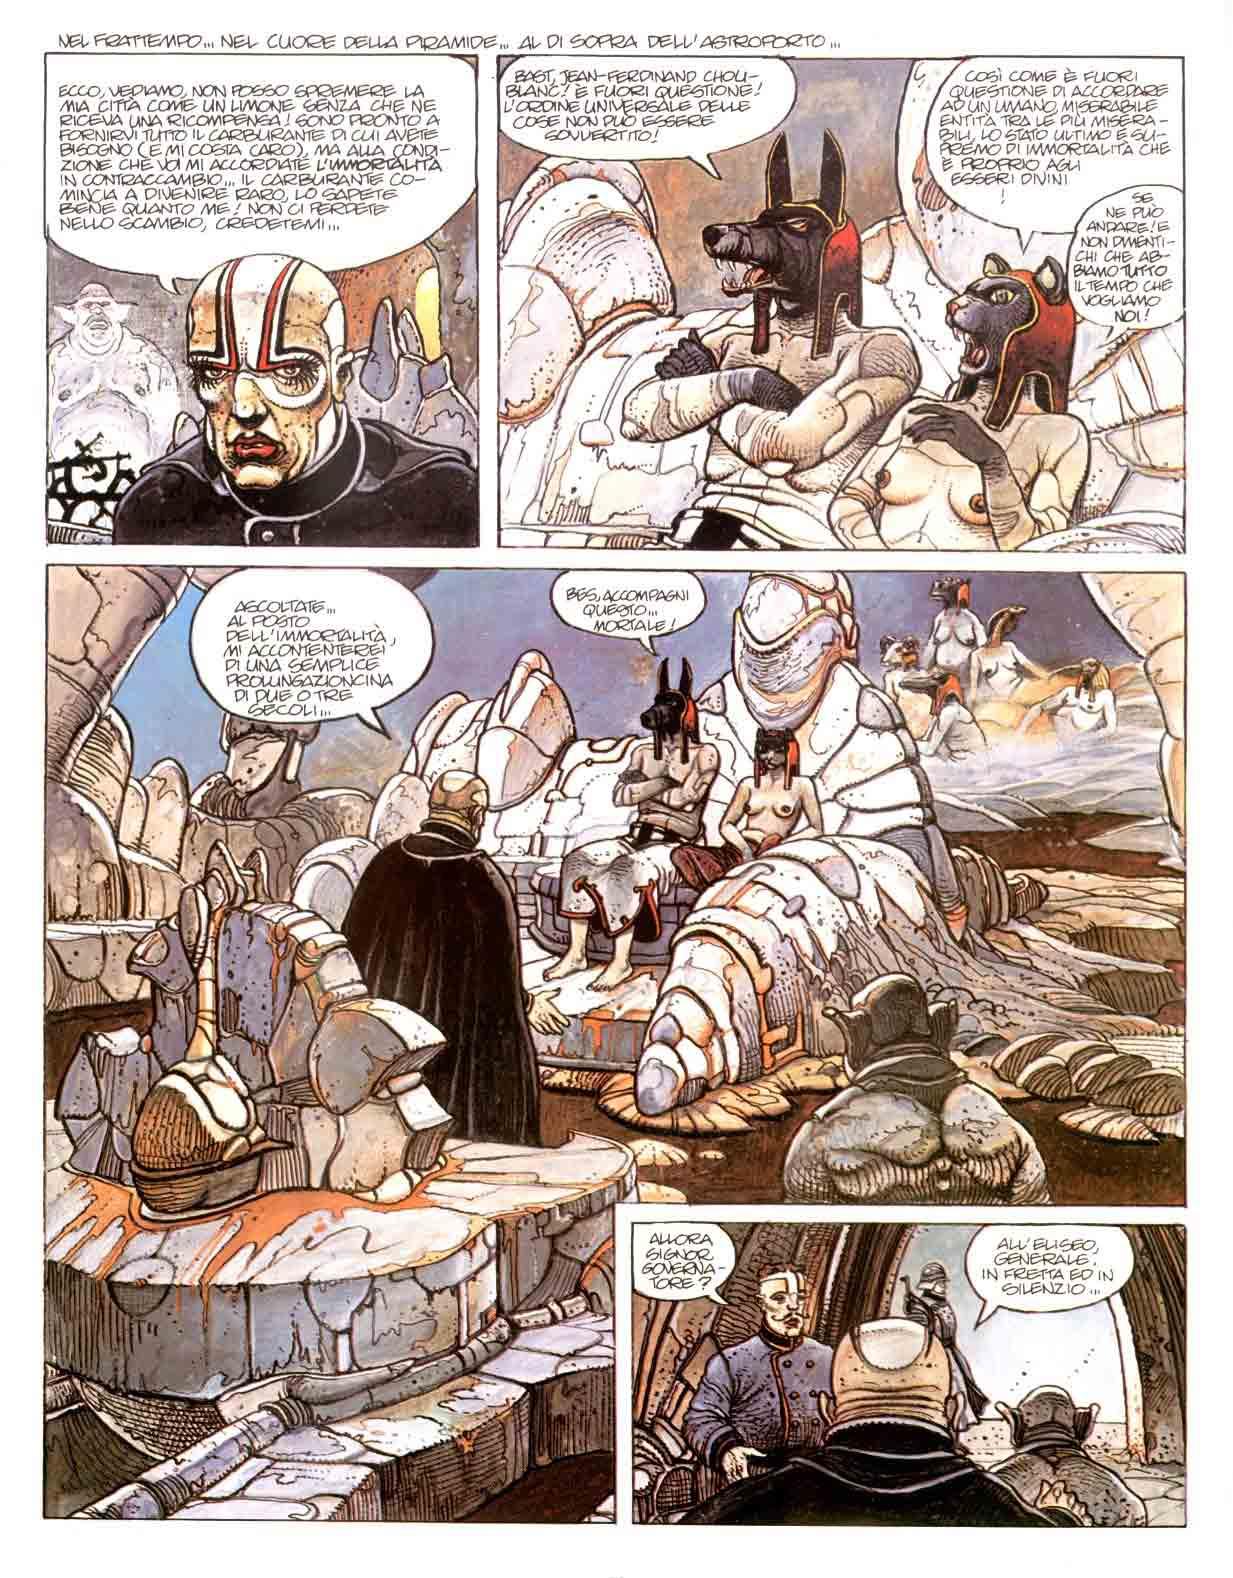 La-trilogia-nikopol-enki-bilal-golem-comics-bd-comic-05